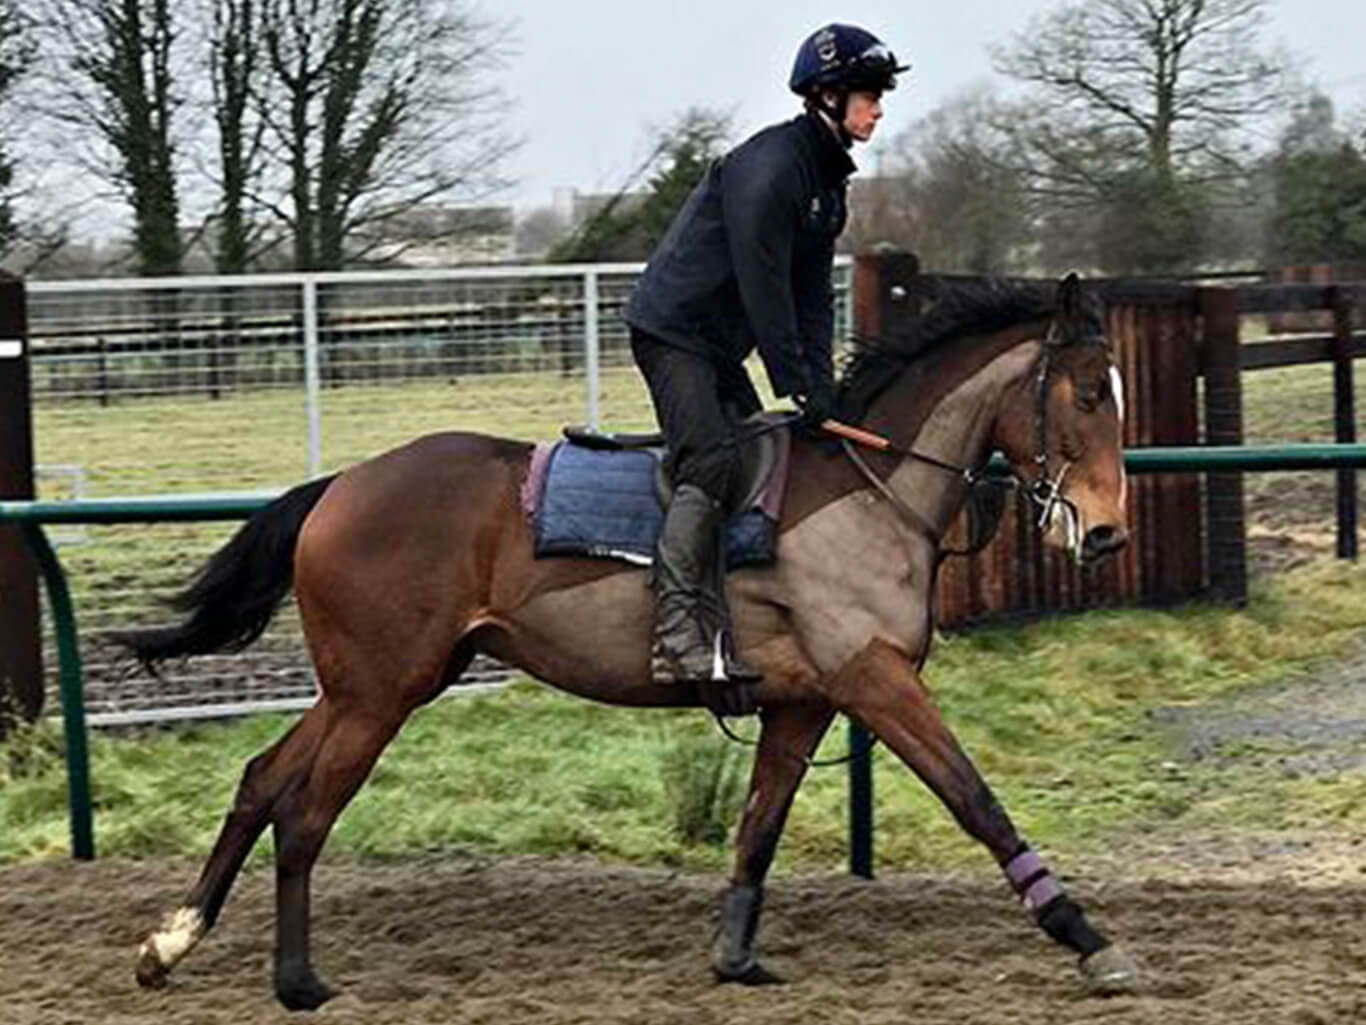 Queen of Paris, Trained by William Knight | Biddestone Racing